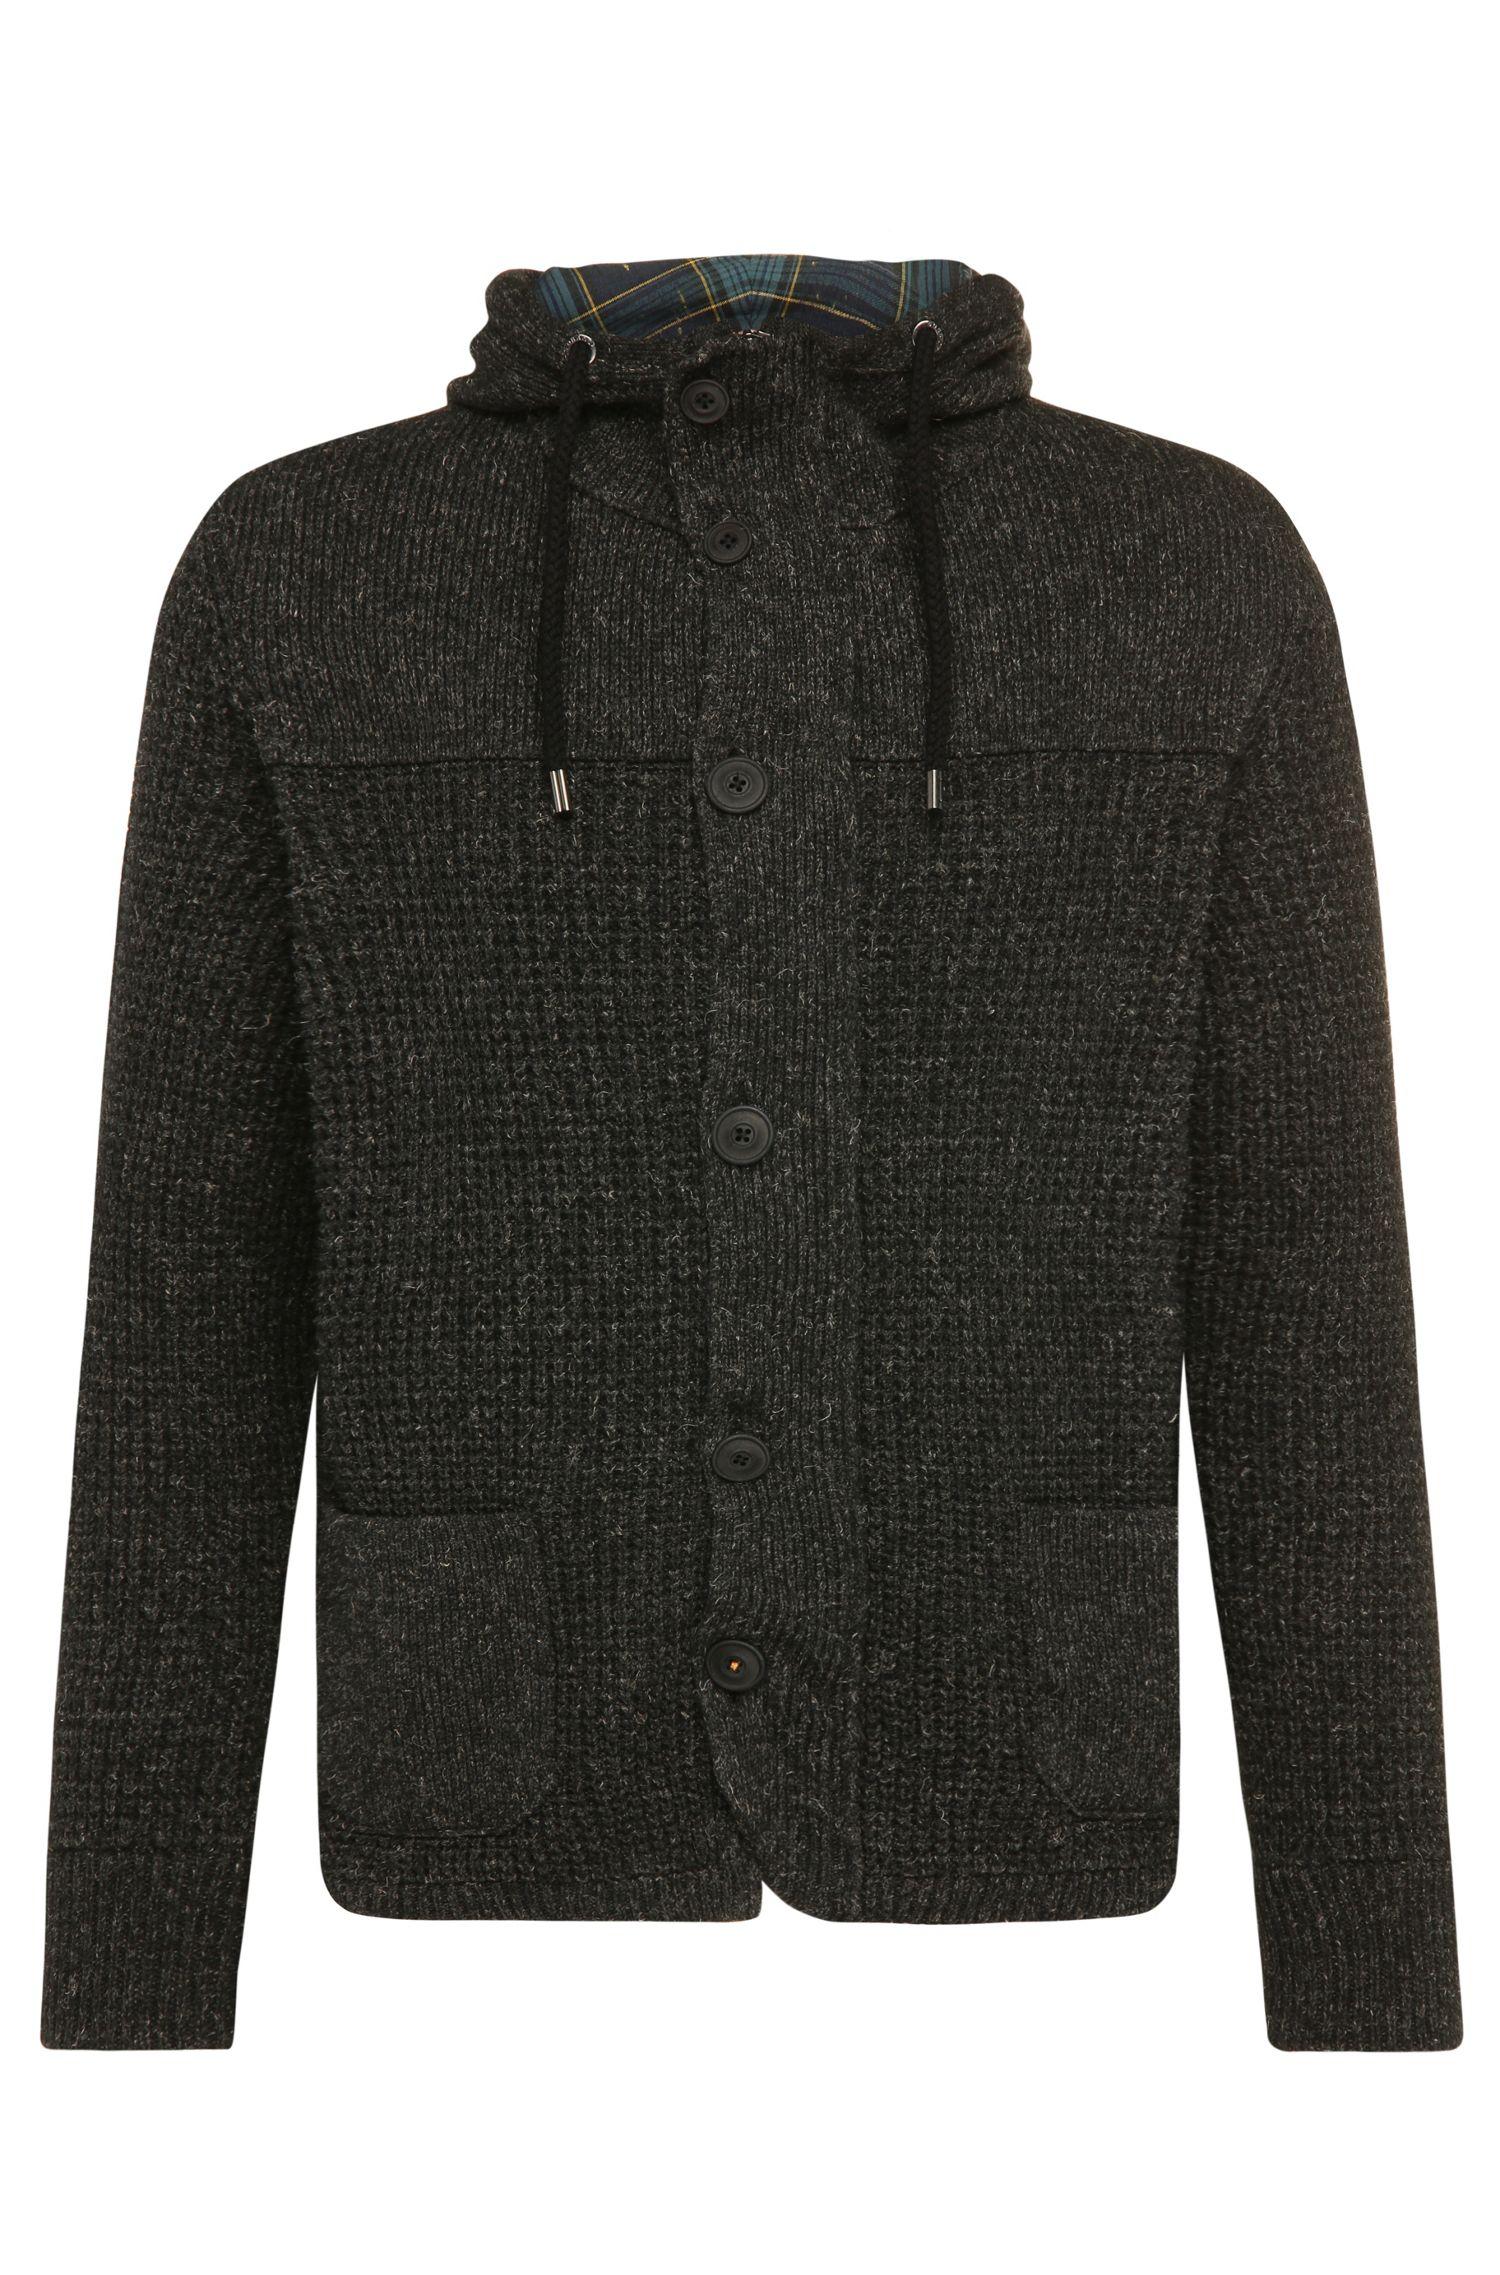 'Korpa' | Wool Linen Blend Hooded Cardigan